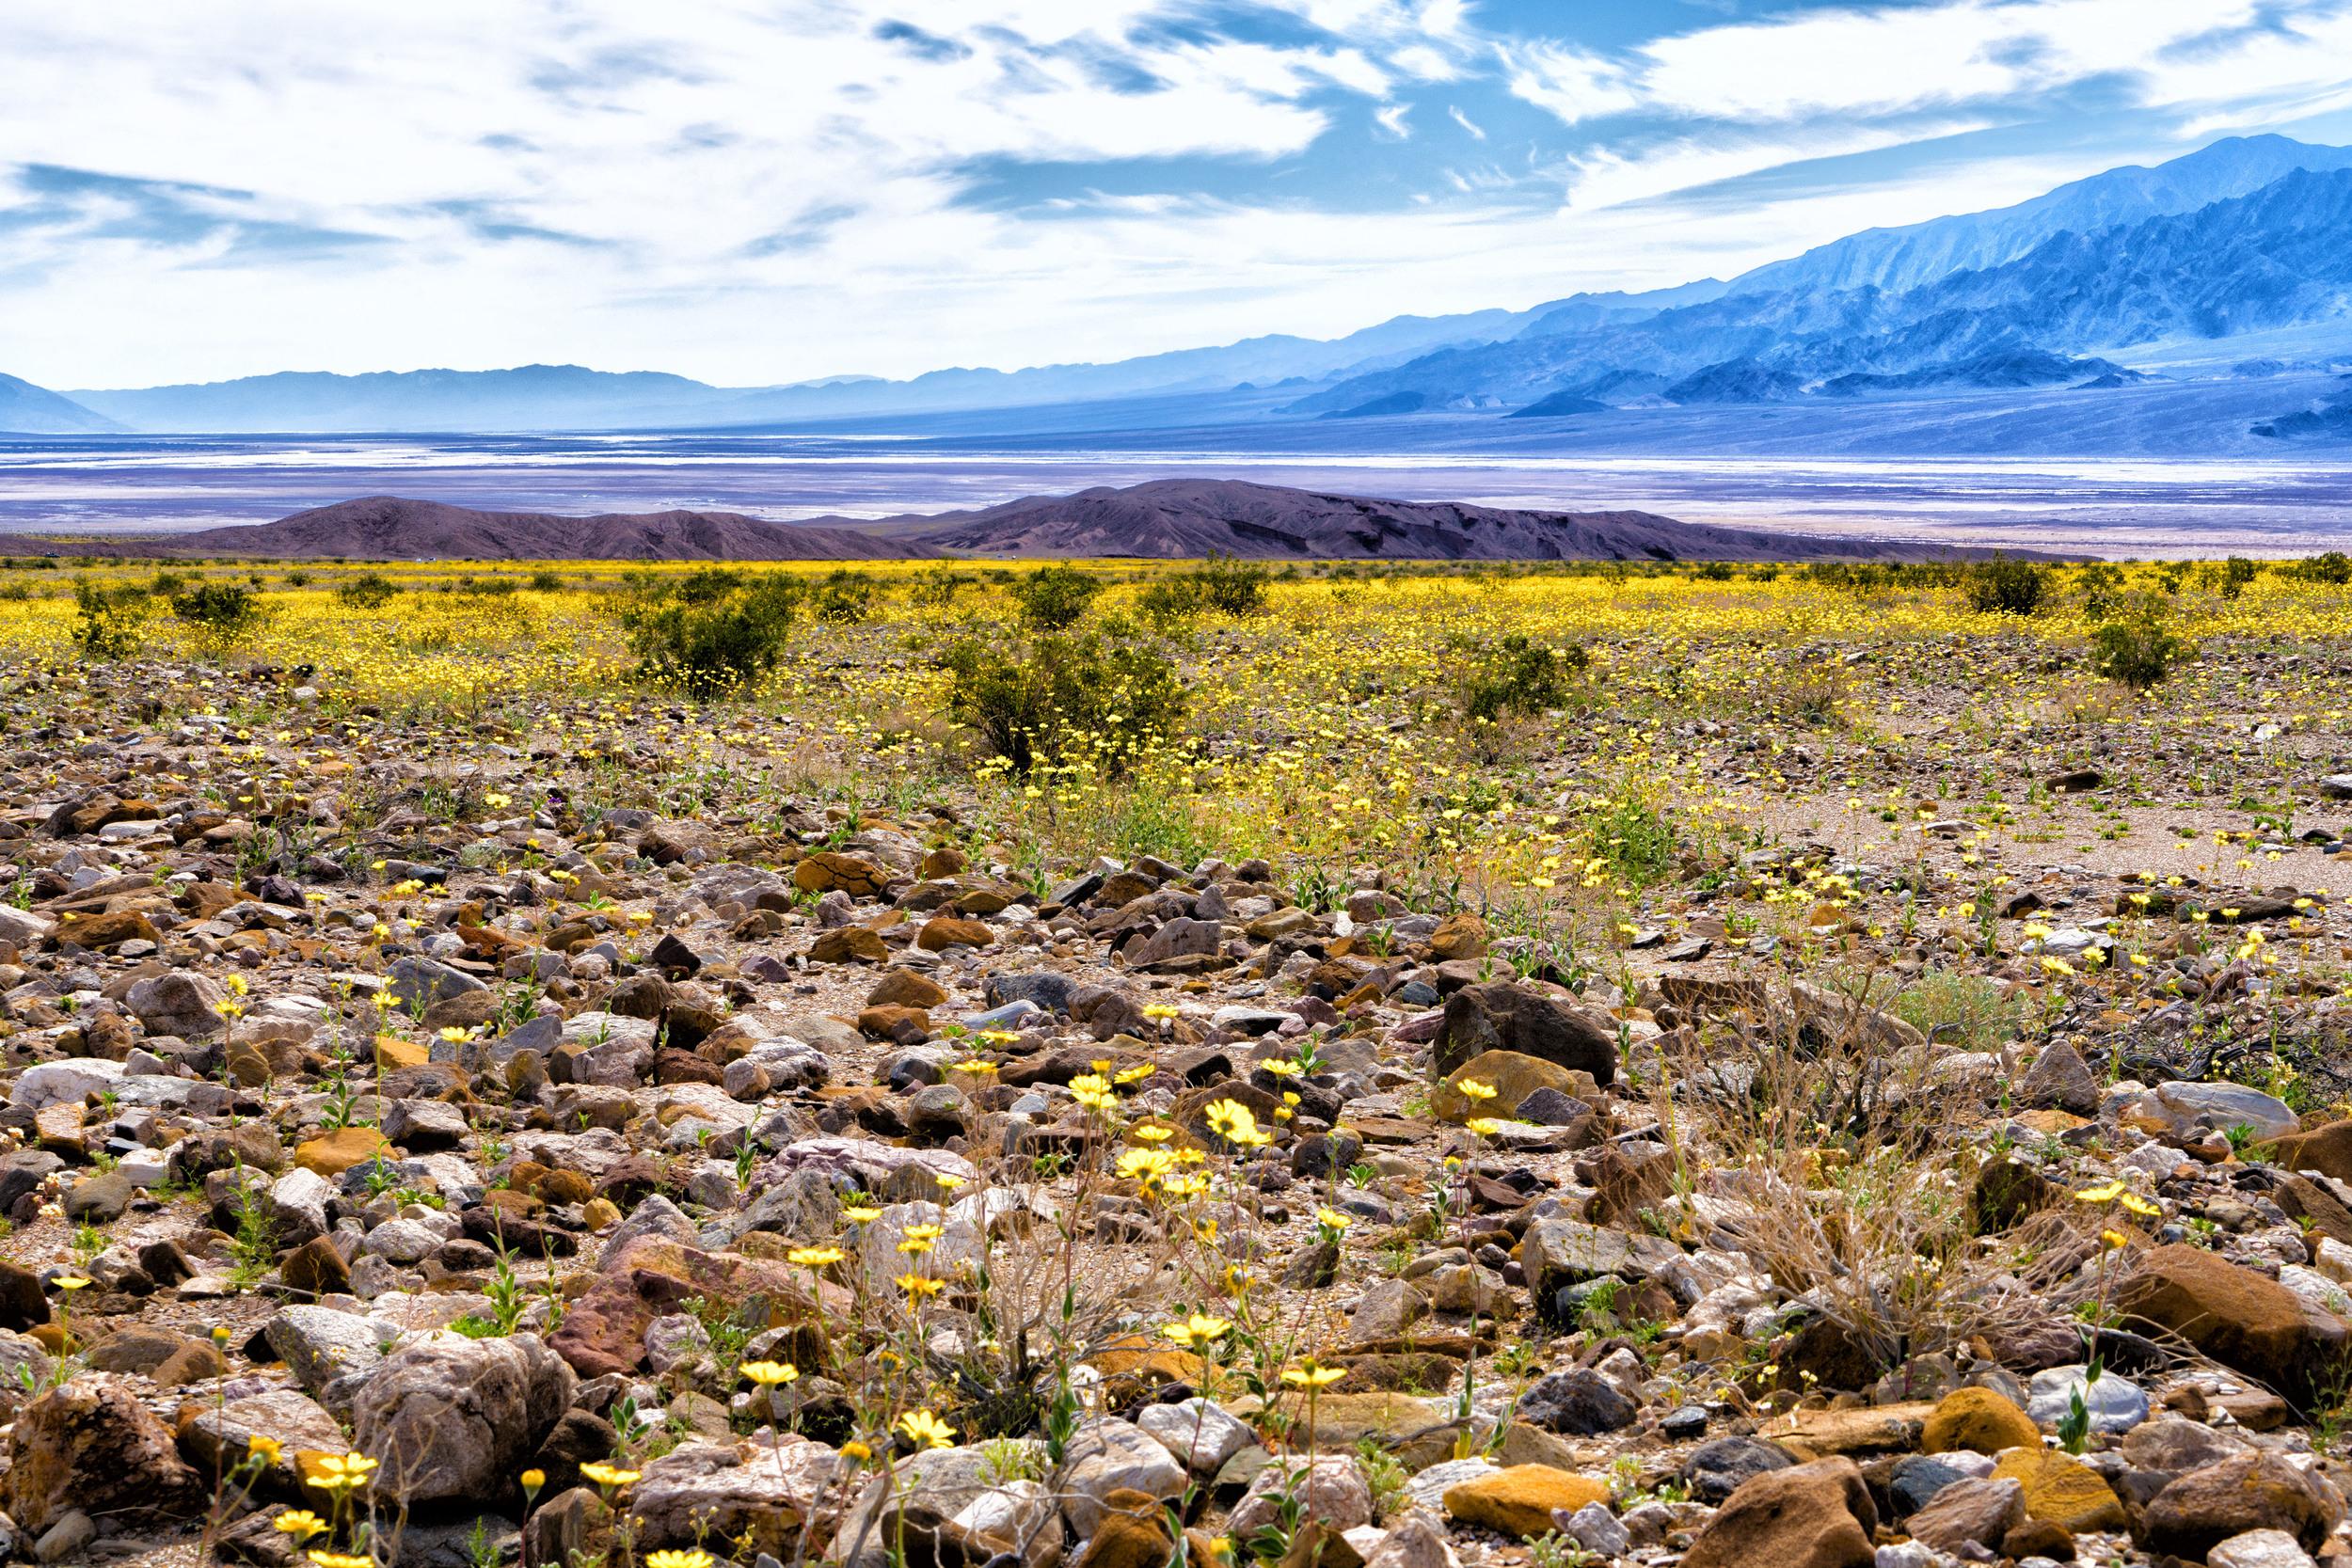 Spring Death Valley National Park, California